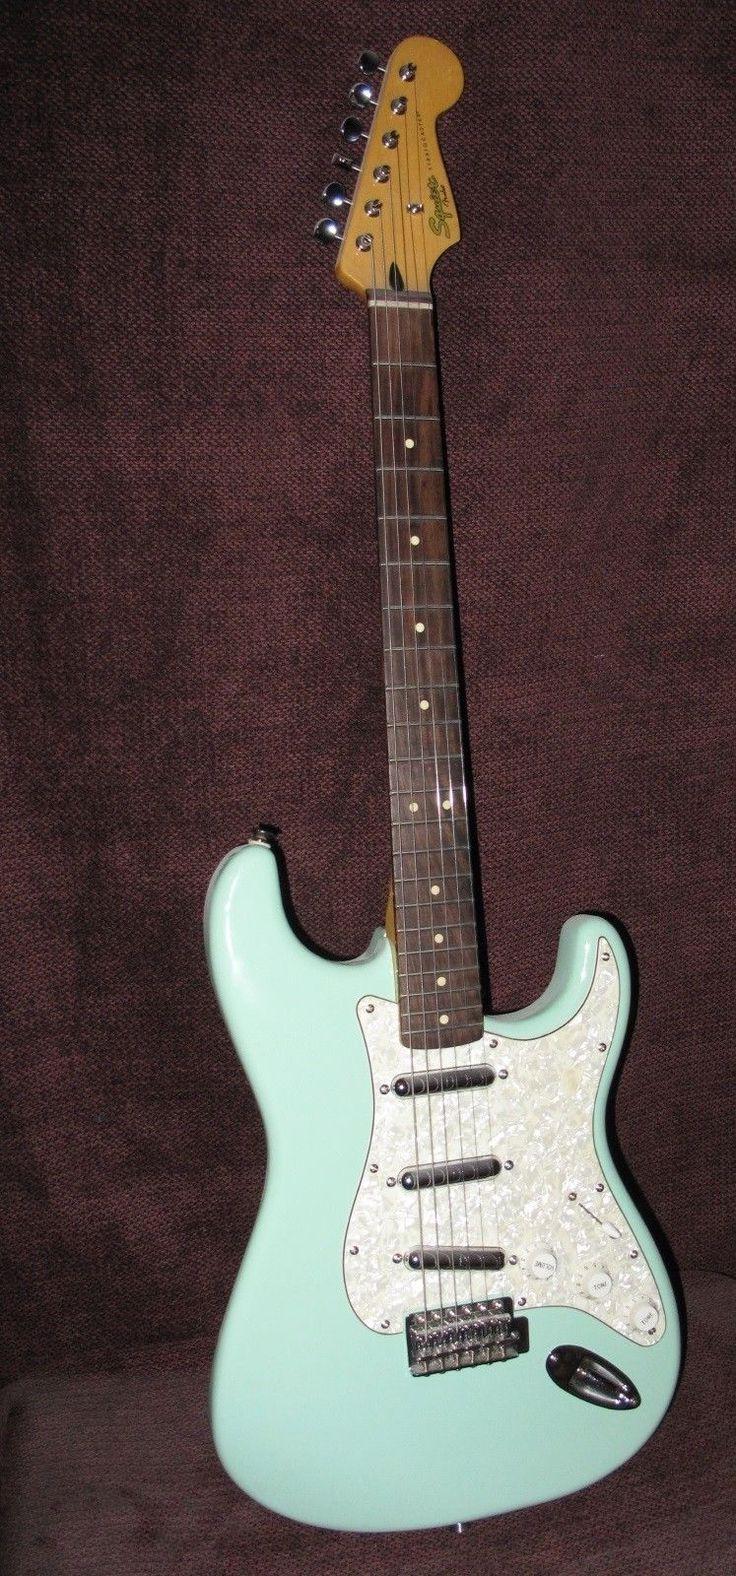 Fender Vintage Modified Surf Guitar Seafoam Green Squier Stratocaster Lipstick